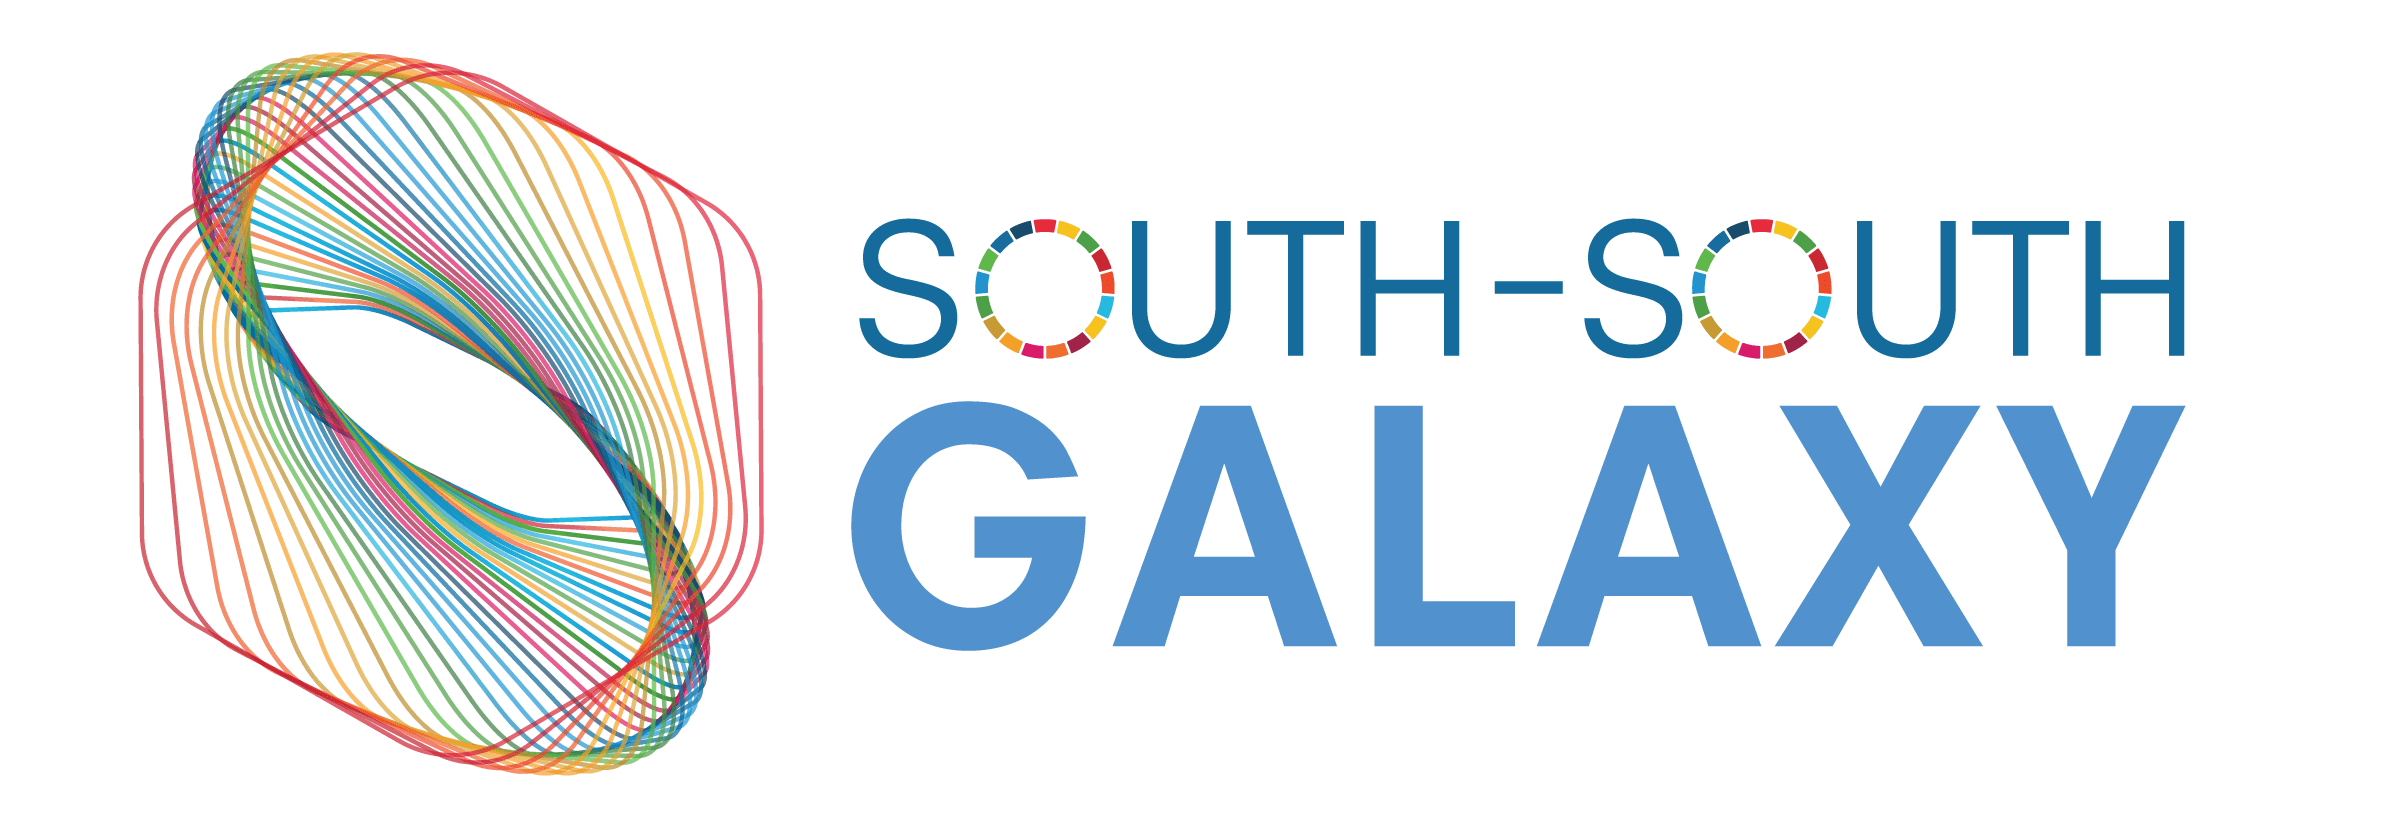 South-South Galaxy